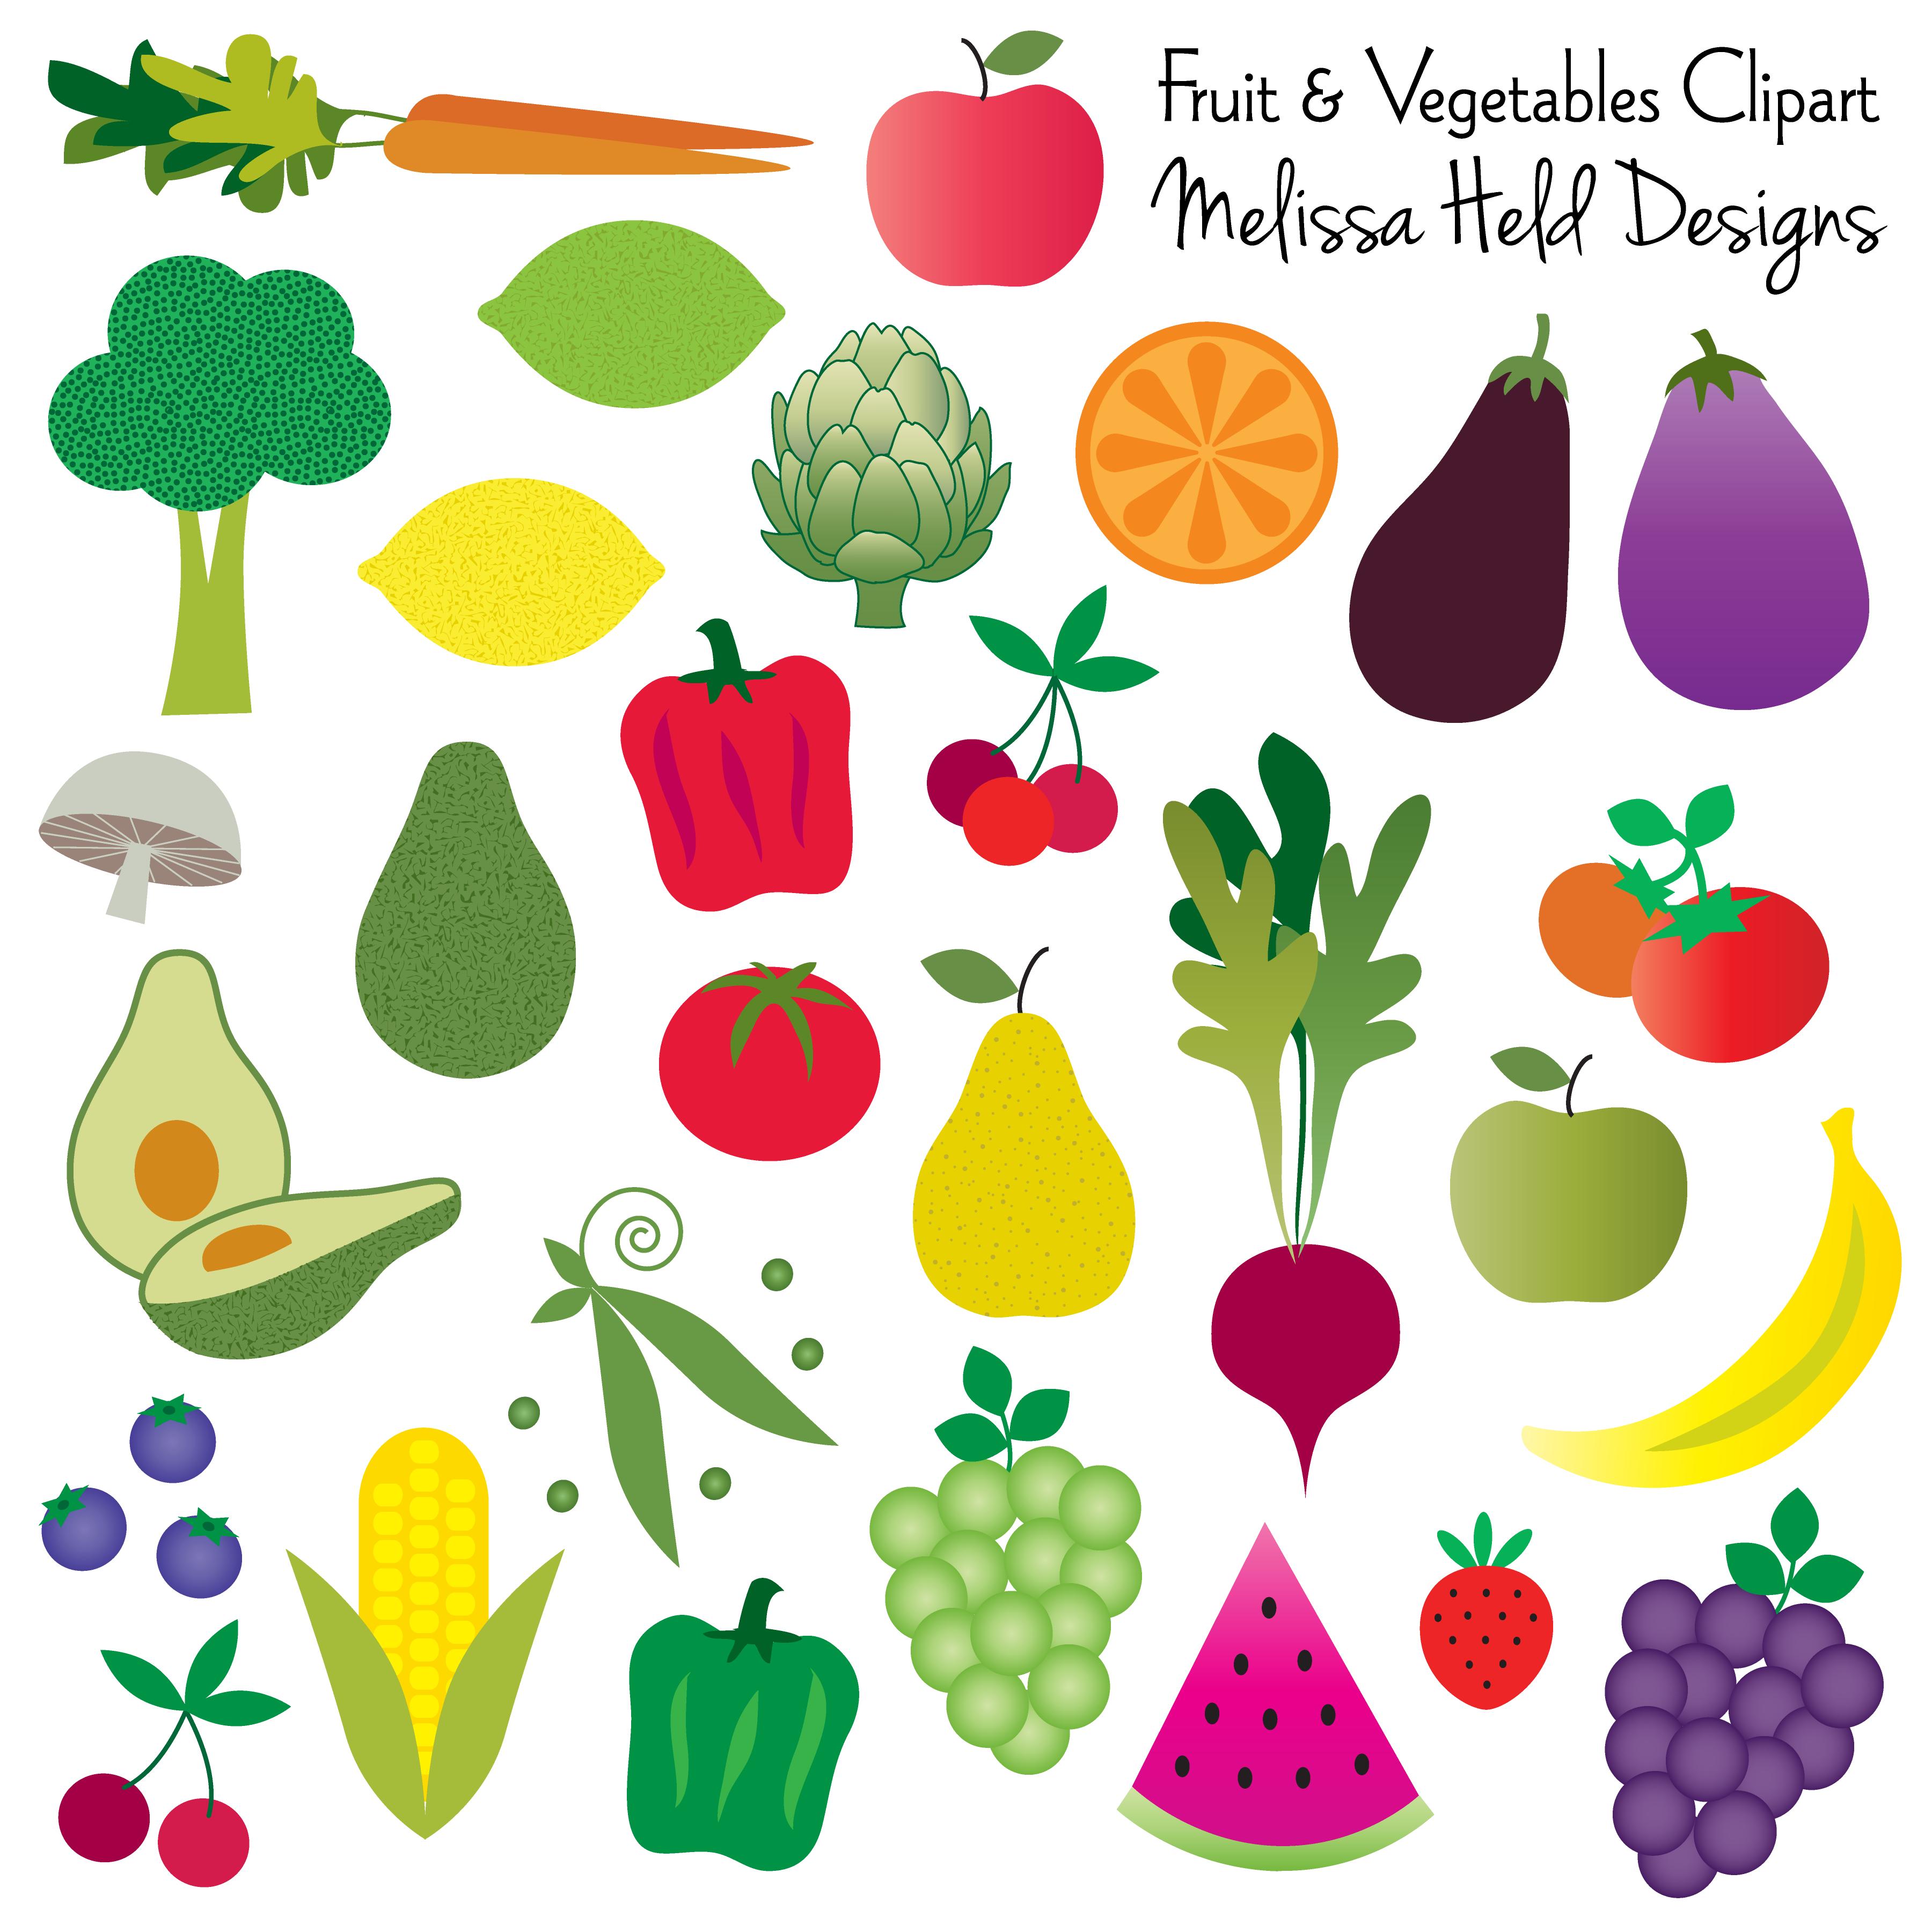 Avocado clipart vegetable. Fruit and vegetables bullet